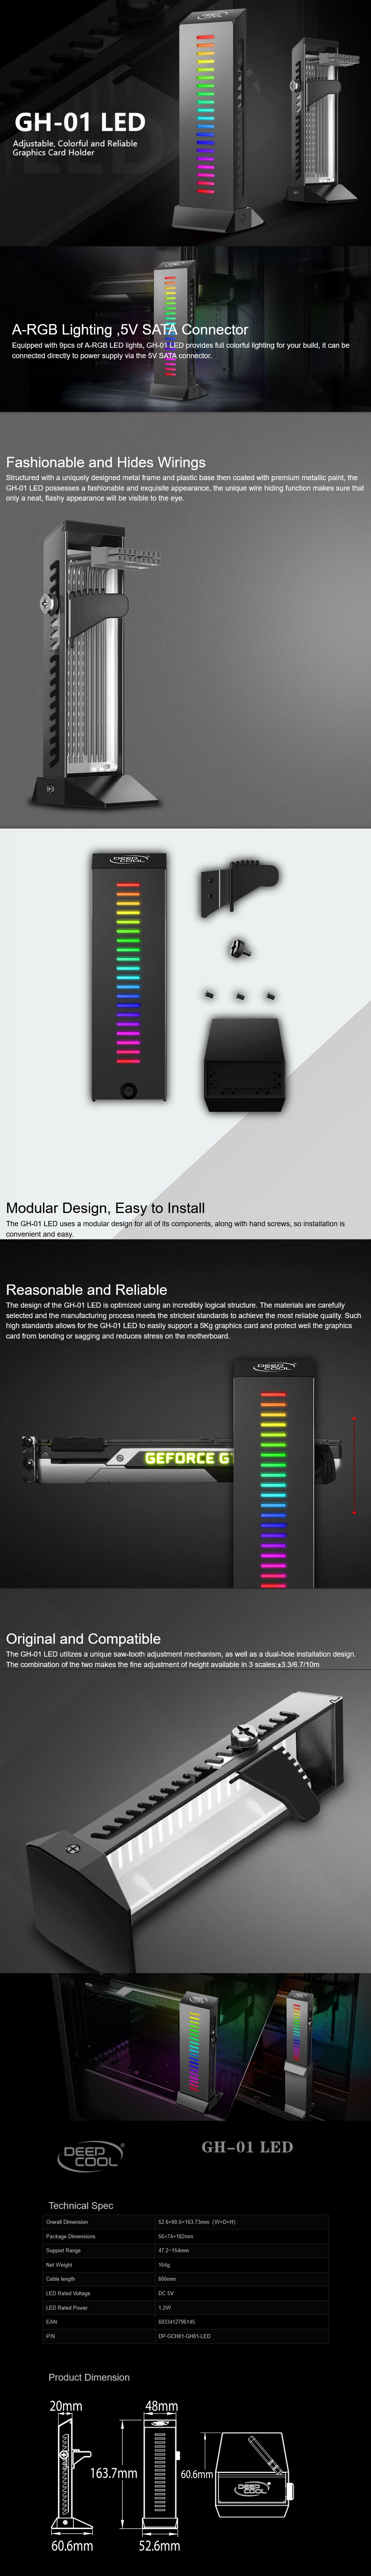 Deepcool GH-01 LED A-RGB Adjustable Internal Graphics Card Holder - Overview 1